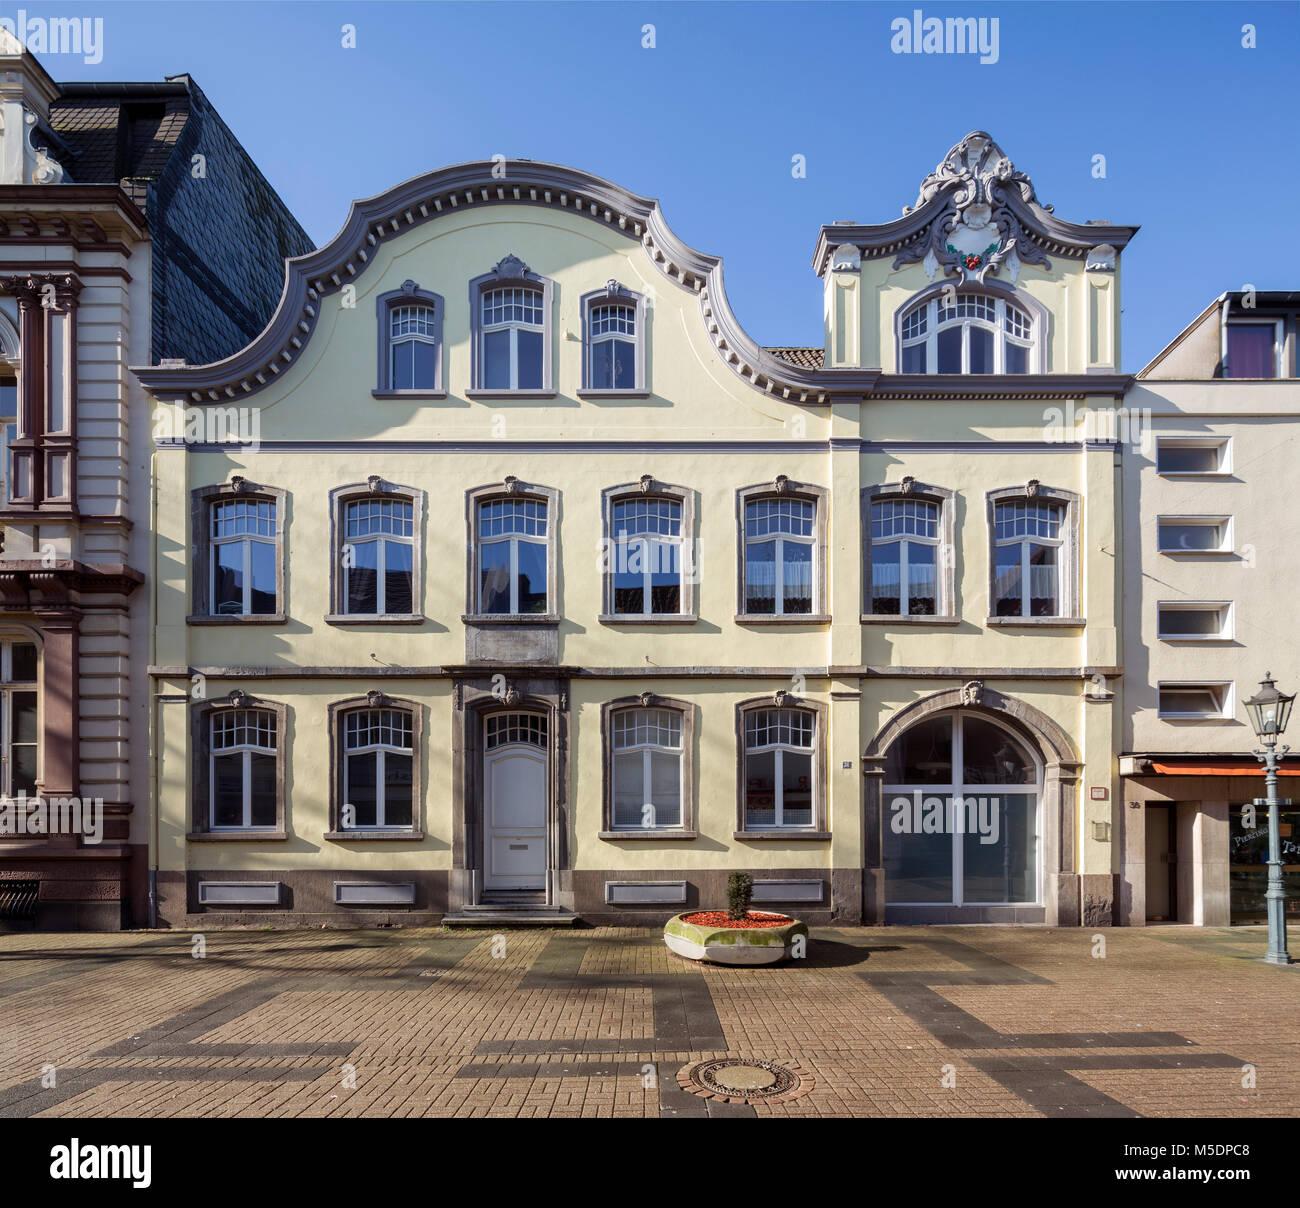 Krefeld-Uerdingen, Wiegelsches Haus, 1754 erbaut Stock Photo